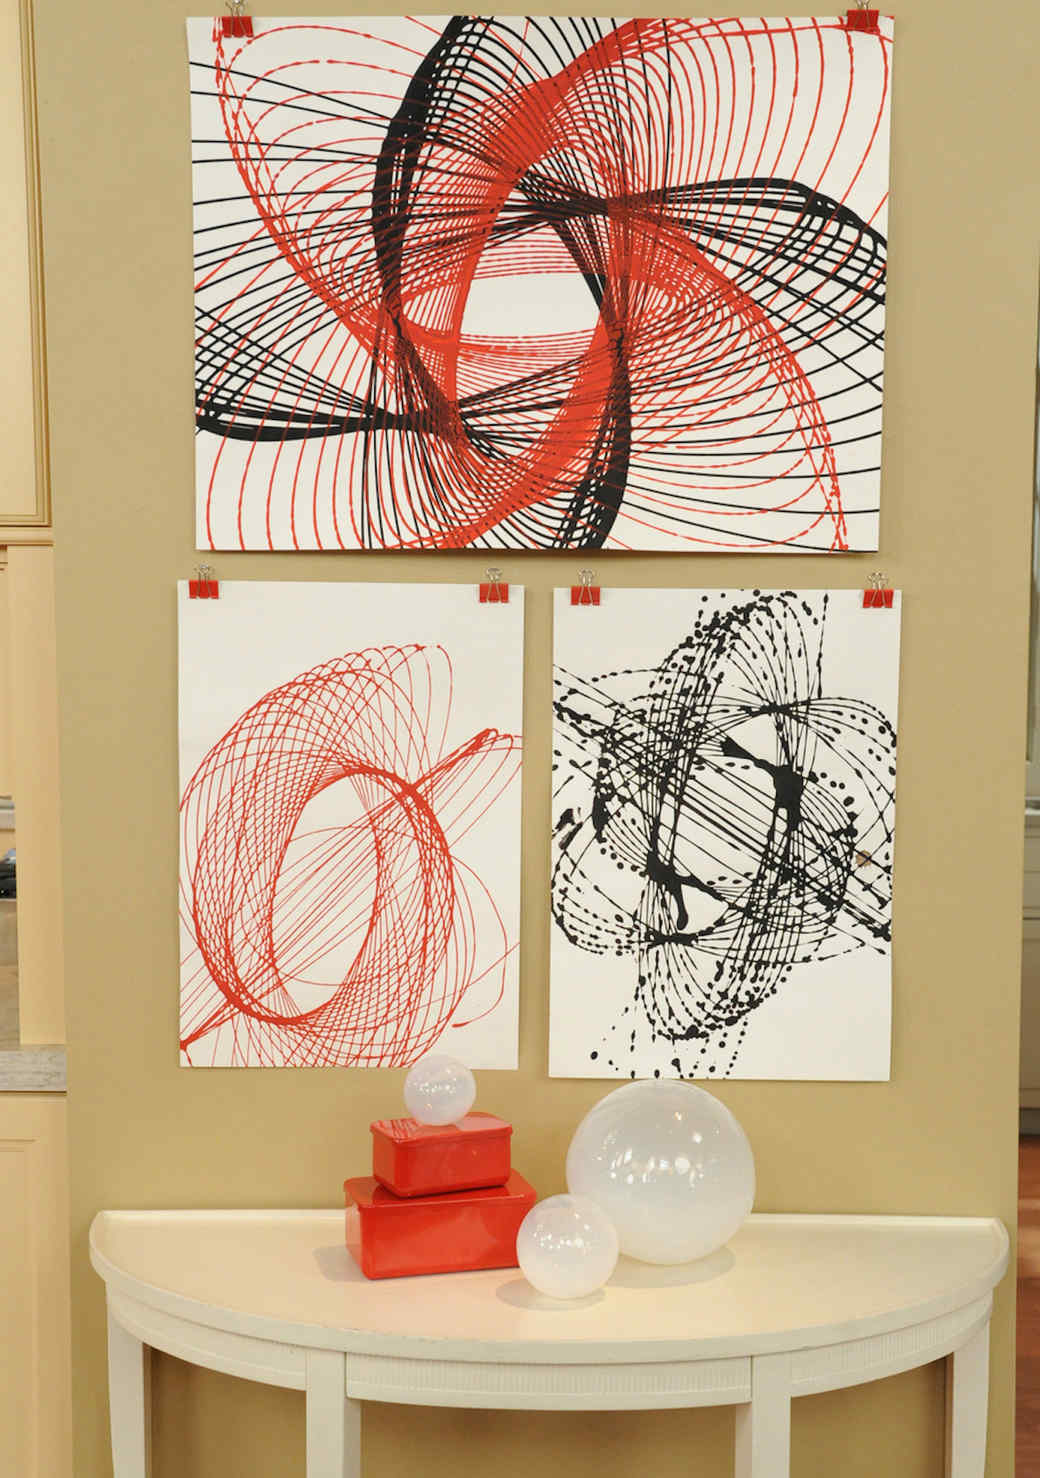 pendulum-painting-1016.jpg (skyword:349574)